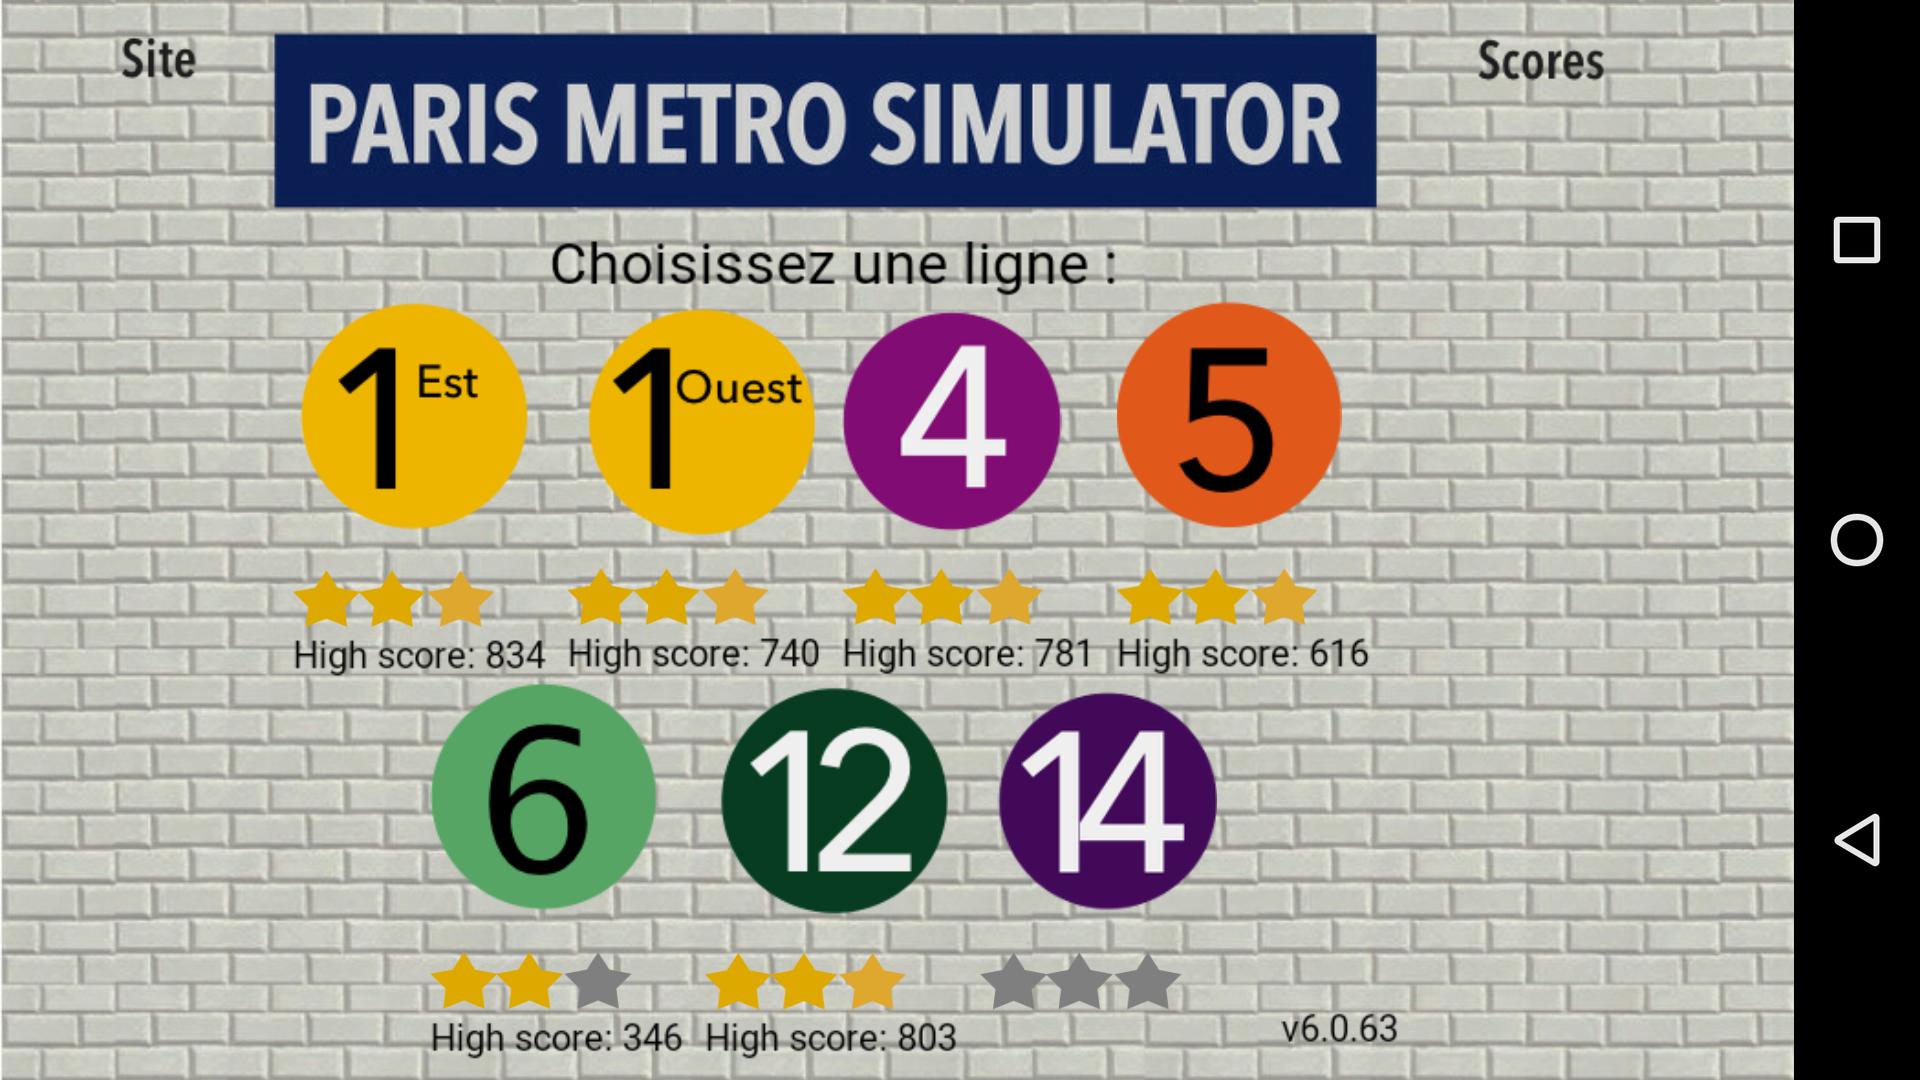 Mantalow: Paris Metro Simulator [Line 12] (Android) 803 points on 2015-12-11 02:08:53